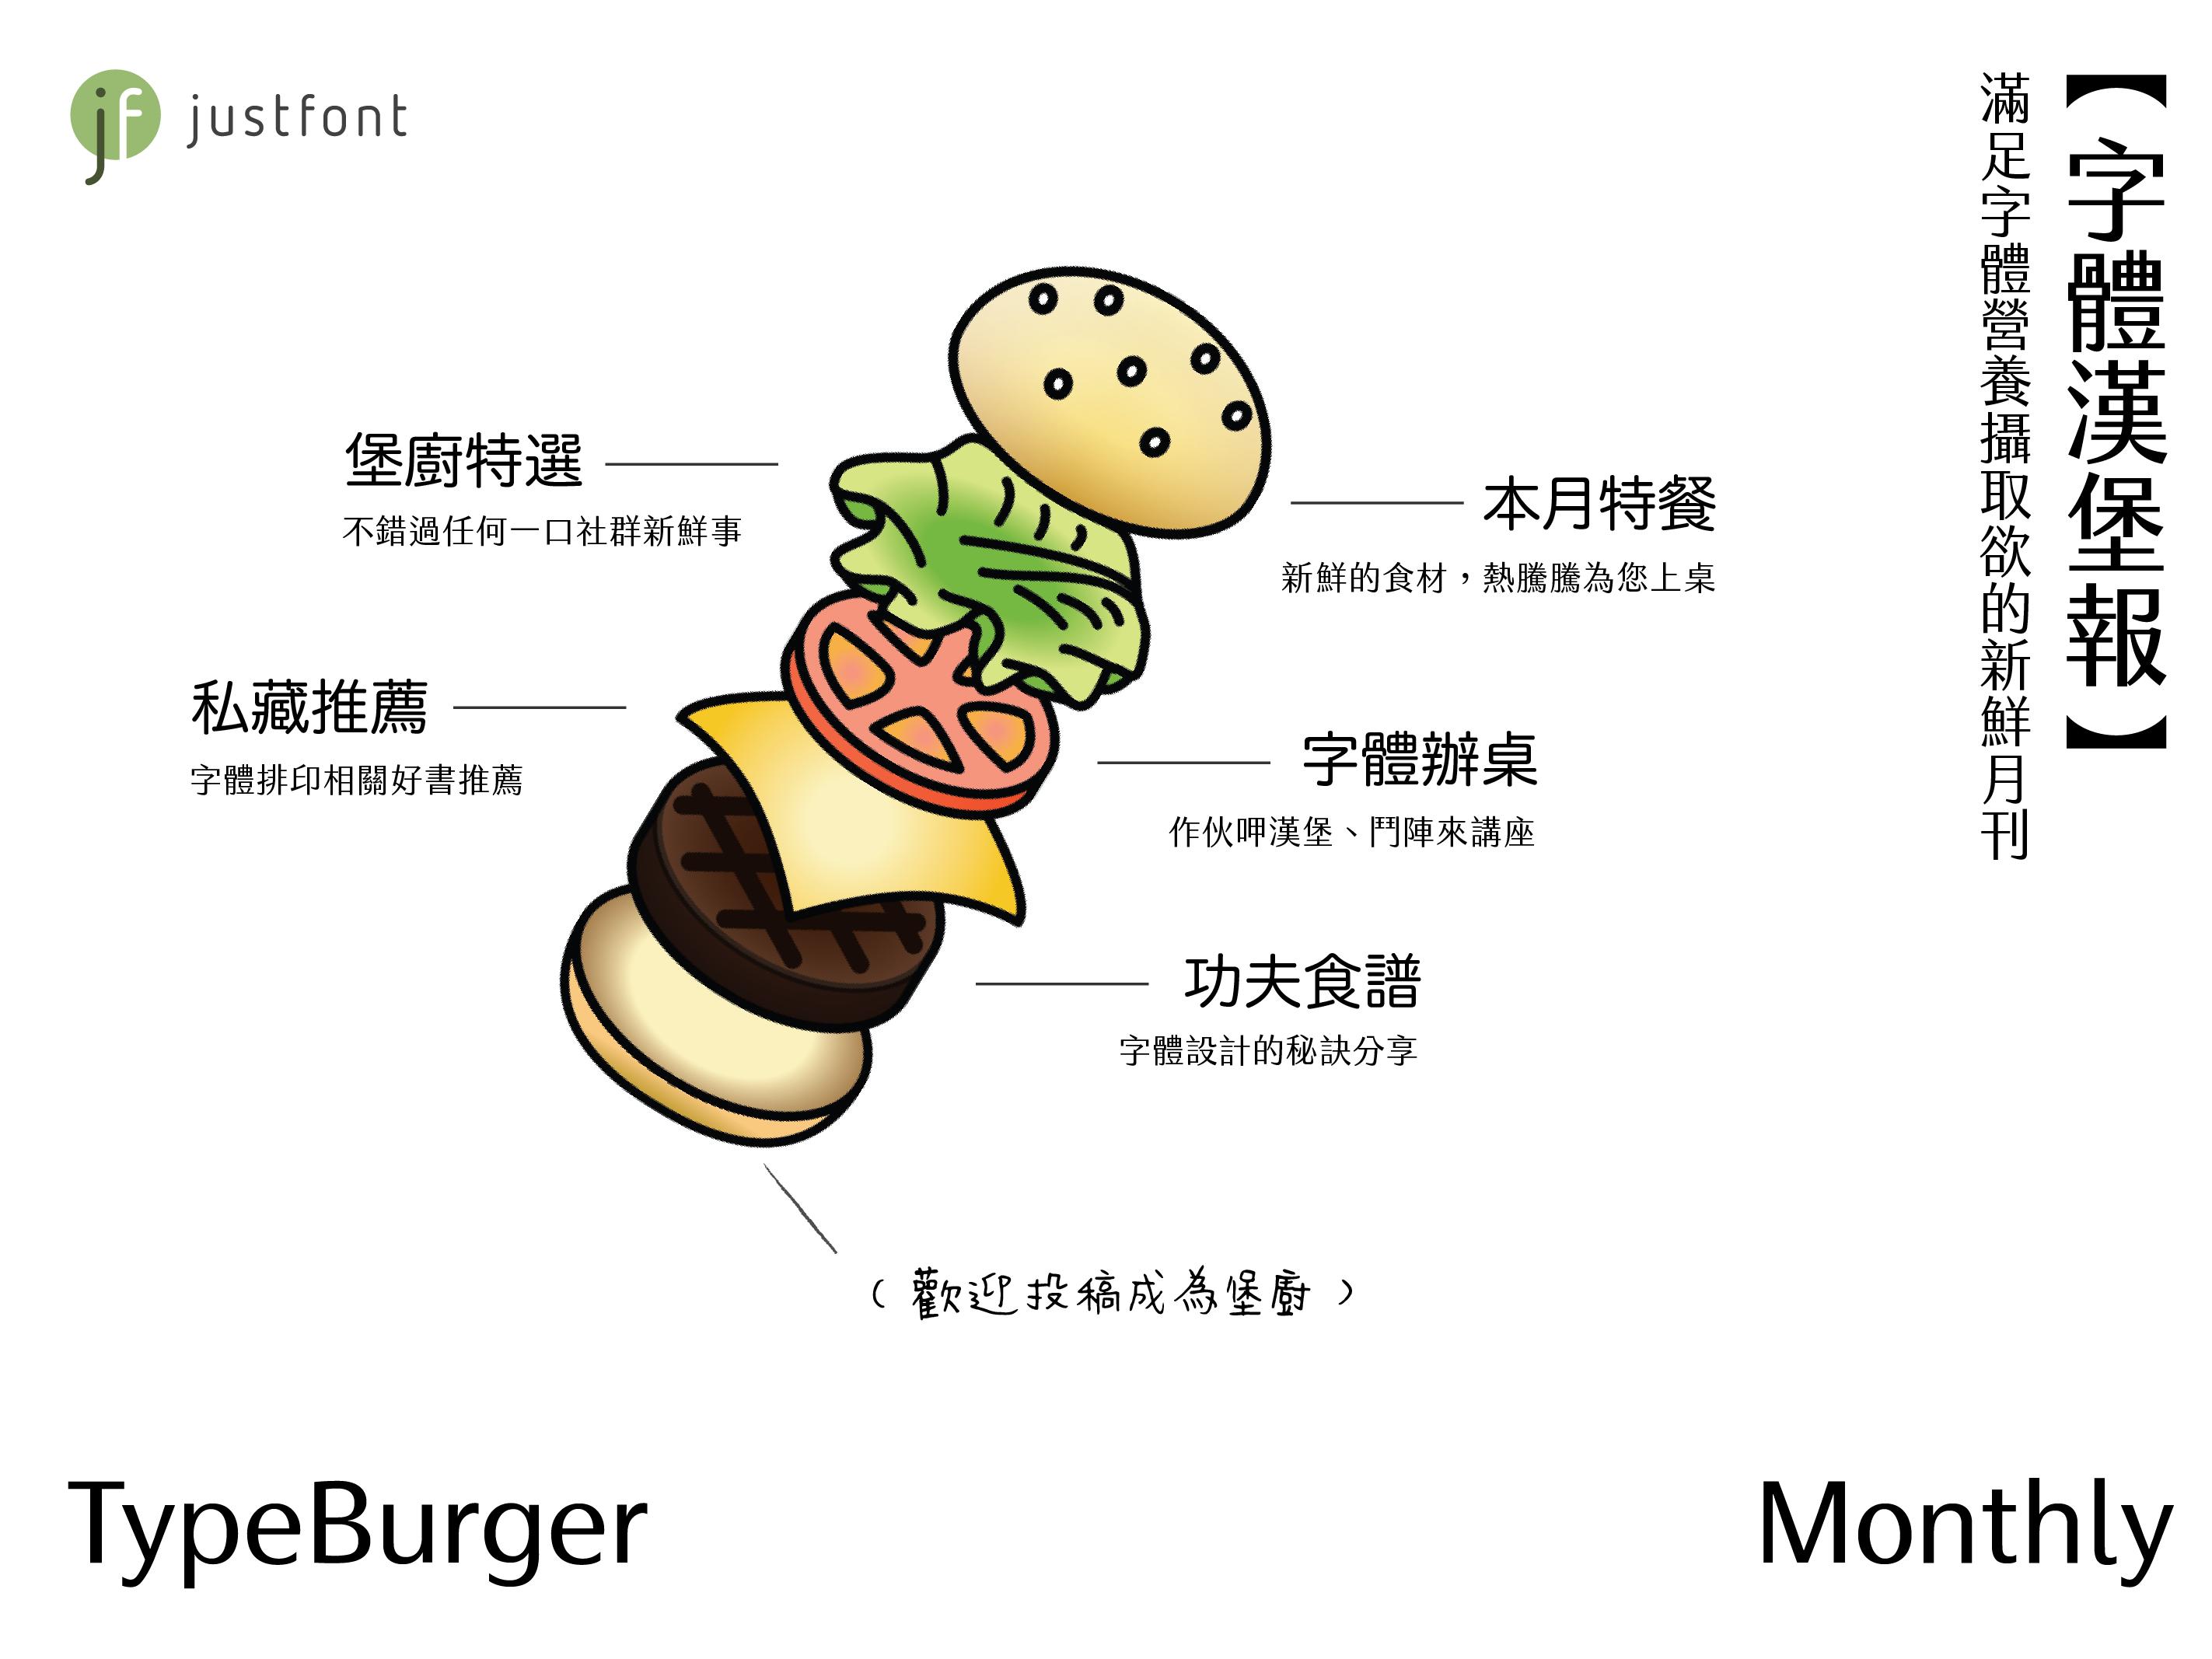 justfont's typeburger